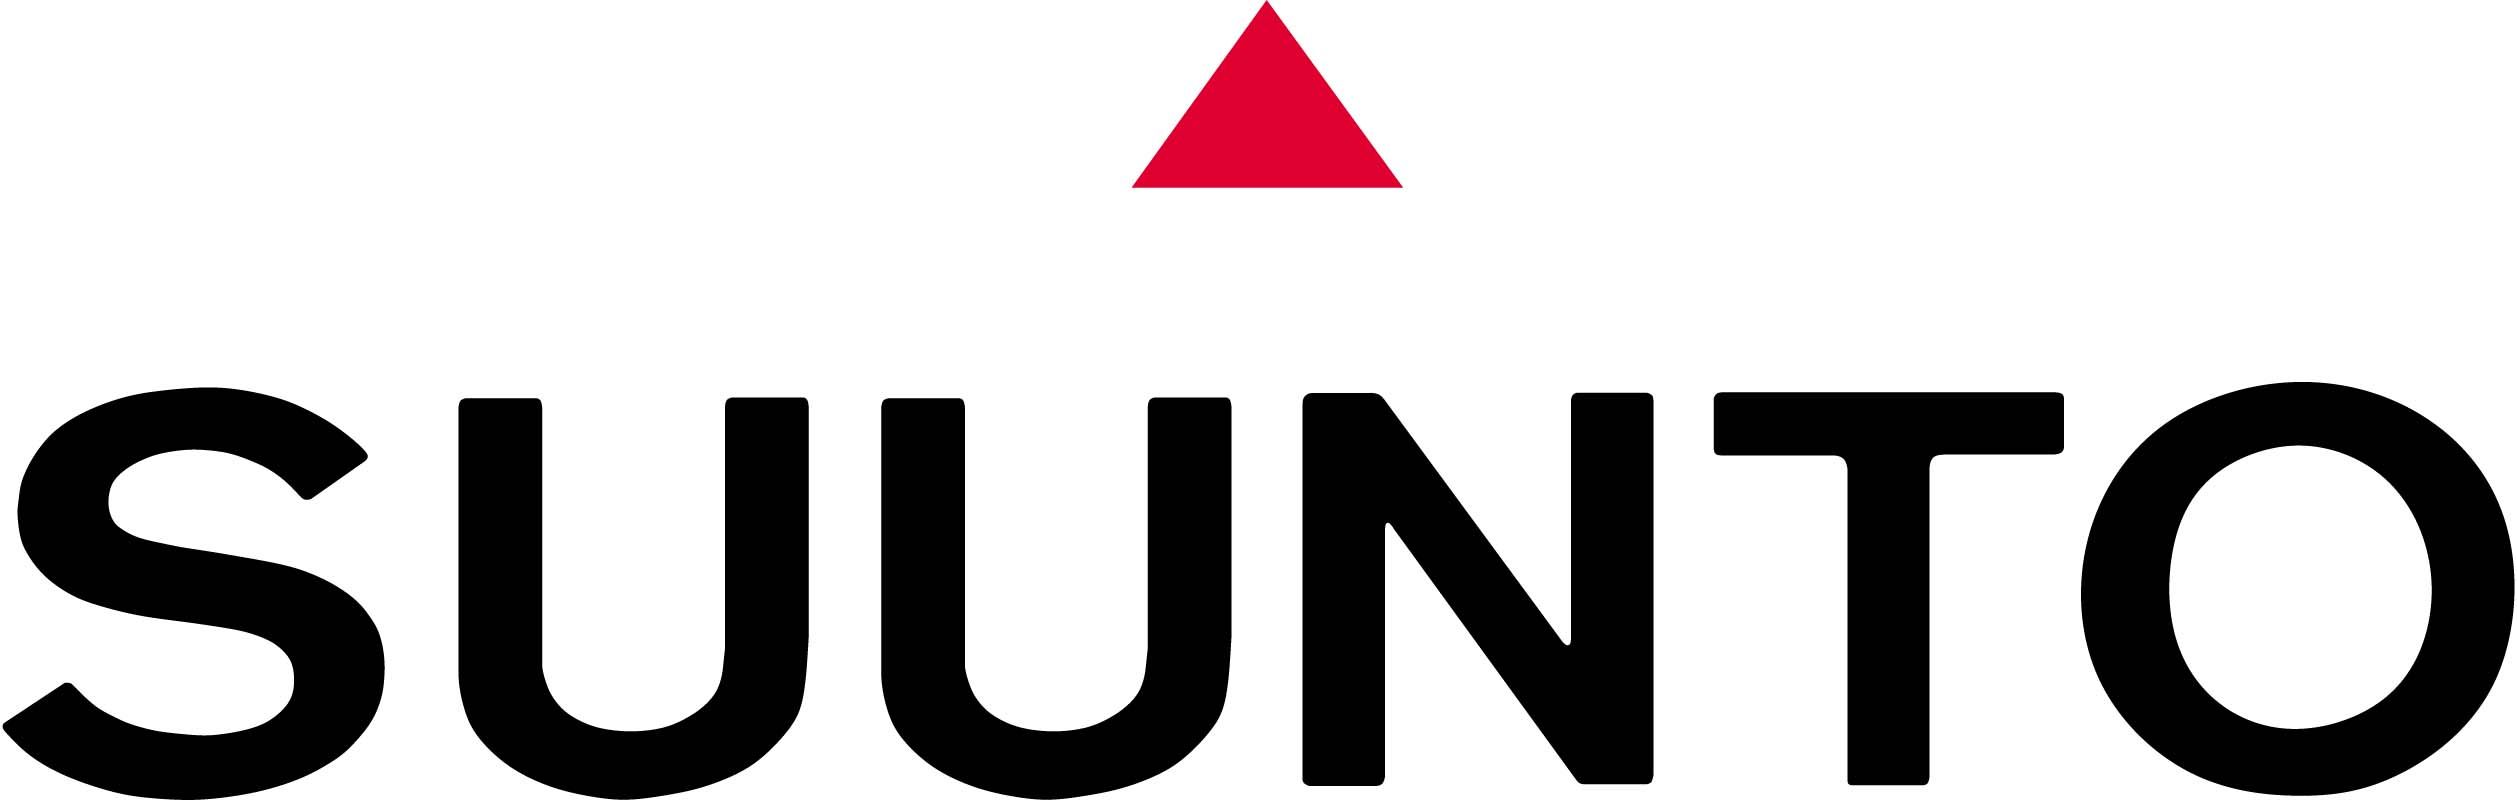 Suunto Logo In White Brand Designs Pinterest